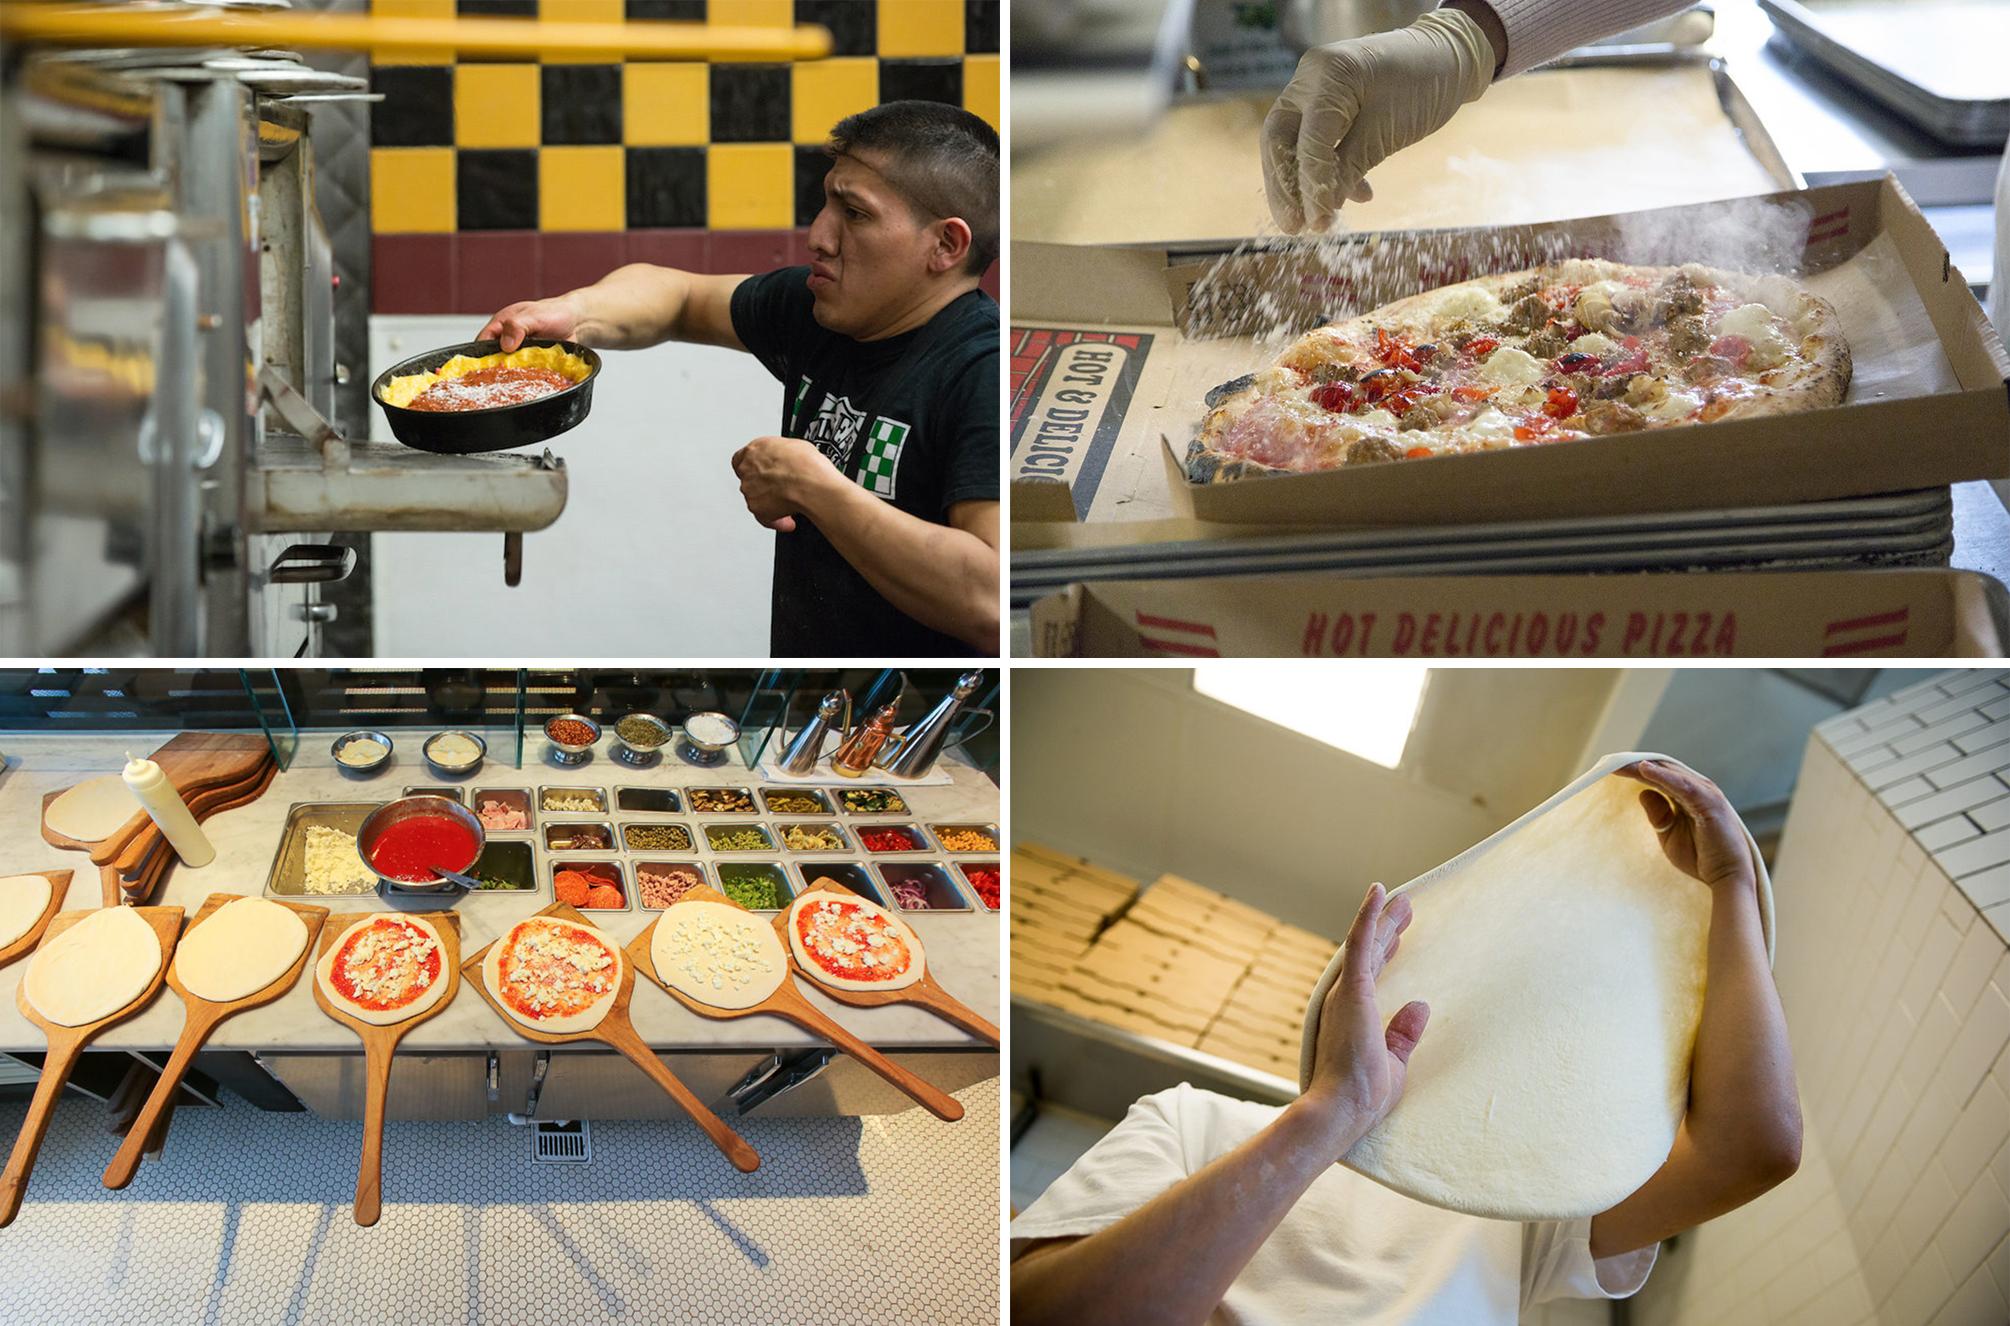 "Clockwise from top left: Gino's East, Chicago [Photo: Justin Barbin]; Antico Pizza Napoletana, Atlanta [Photo: <a href=""http://www.mweats.com/"">Matthew Wong</a>]; 2 Amys, DC [Photo: <a href=""http://underabushel.com/"">R. Lopez</a>]; Pizzeria Locale,"